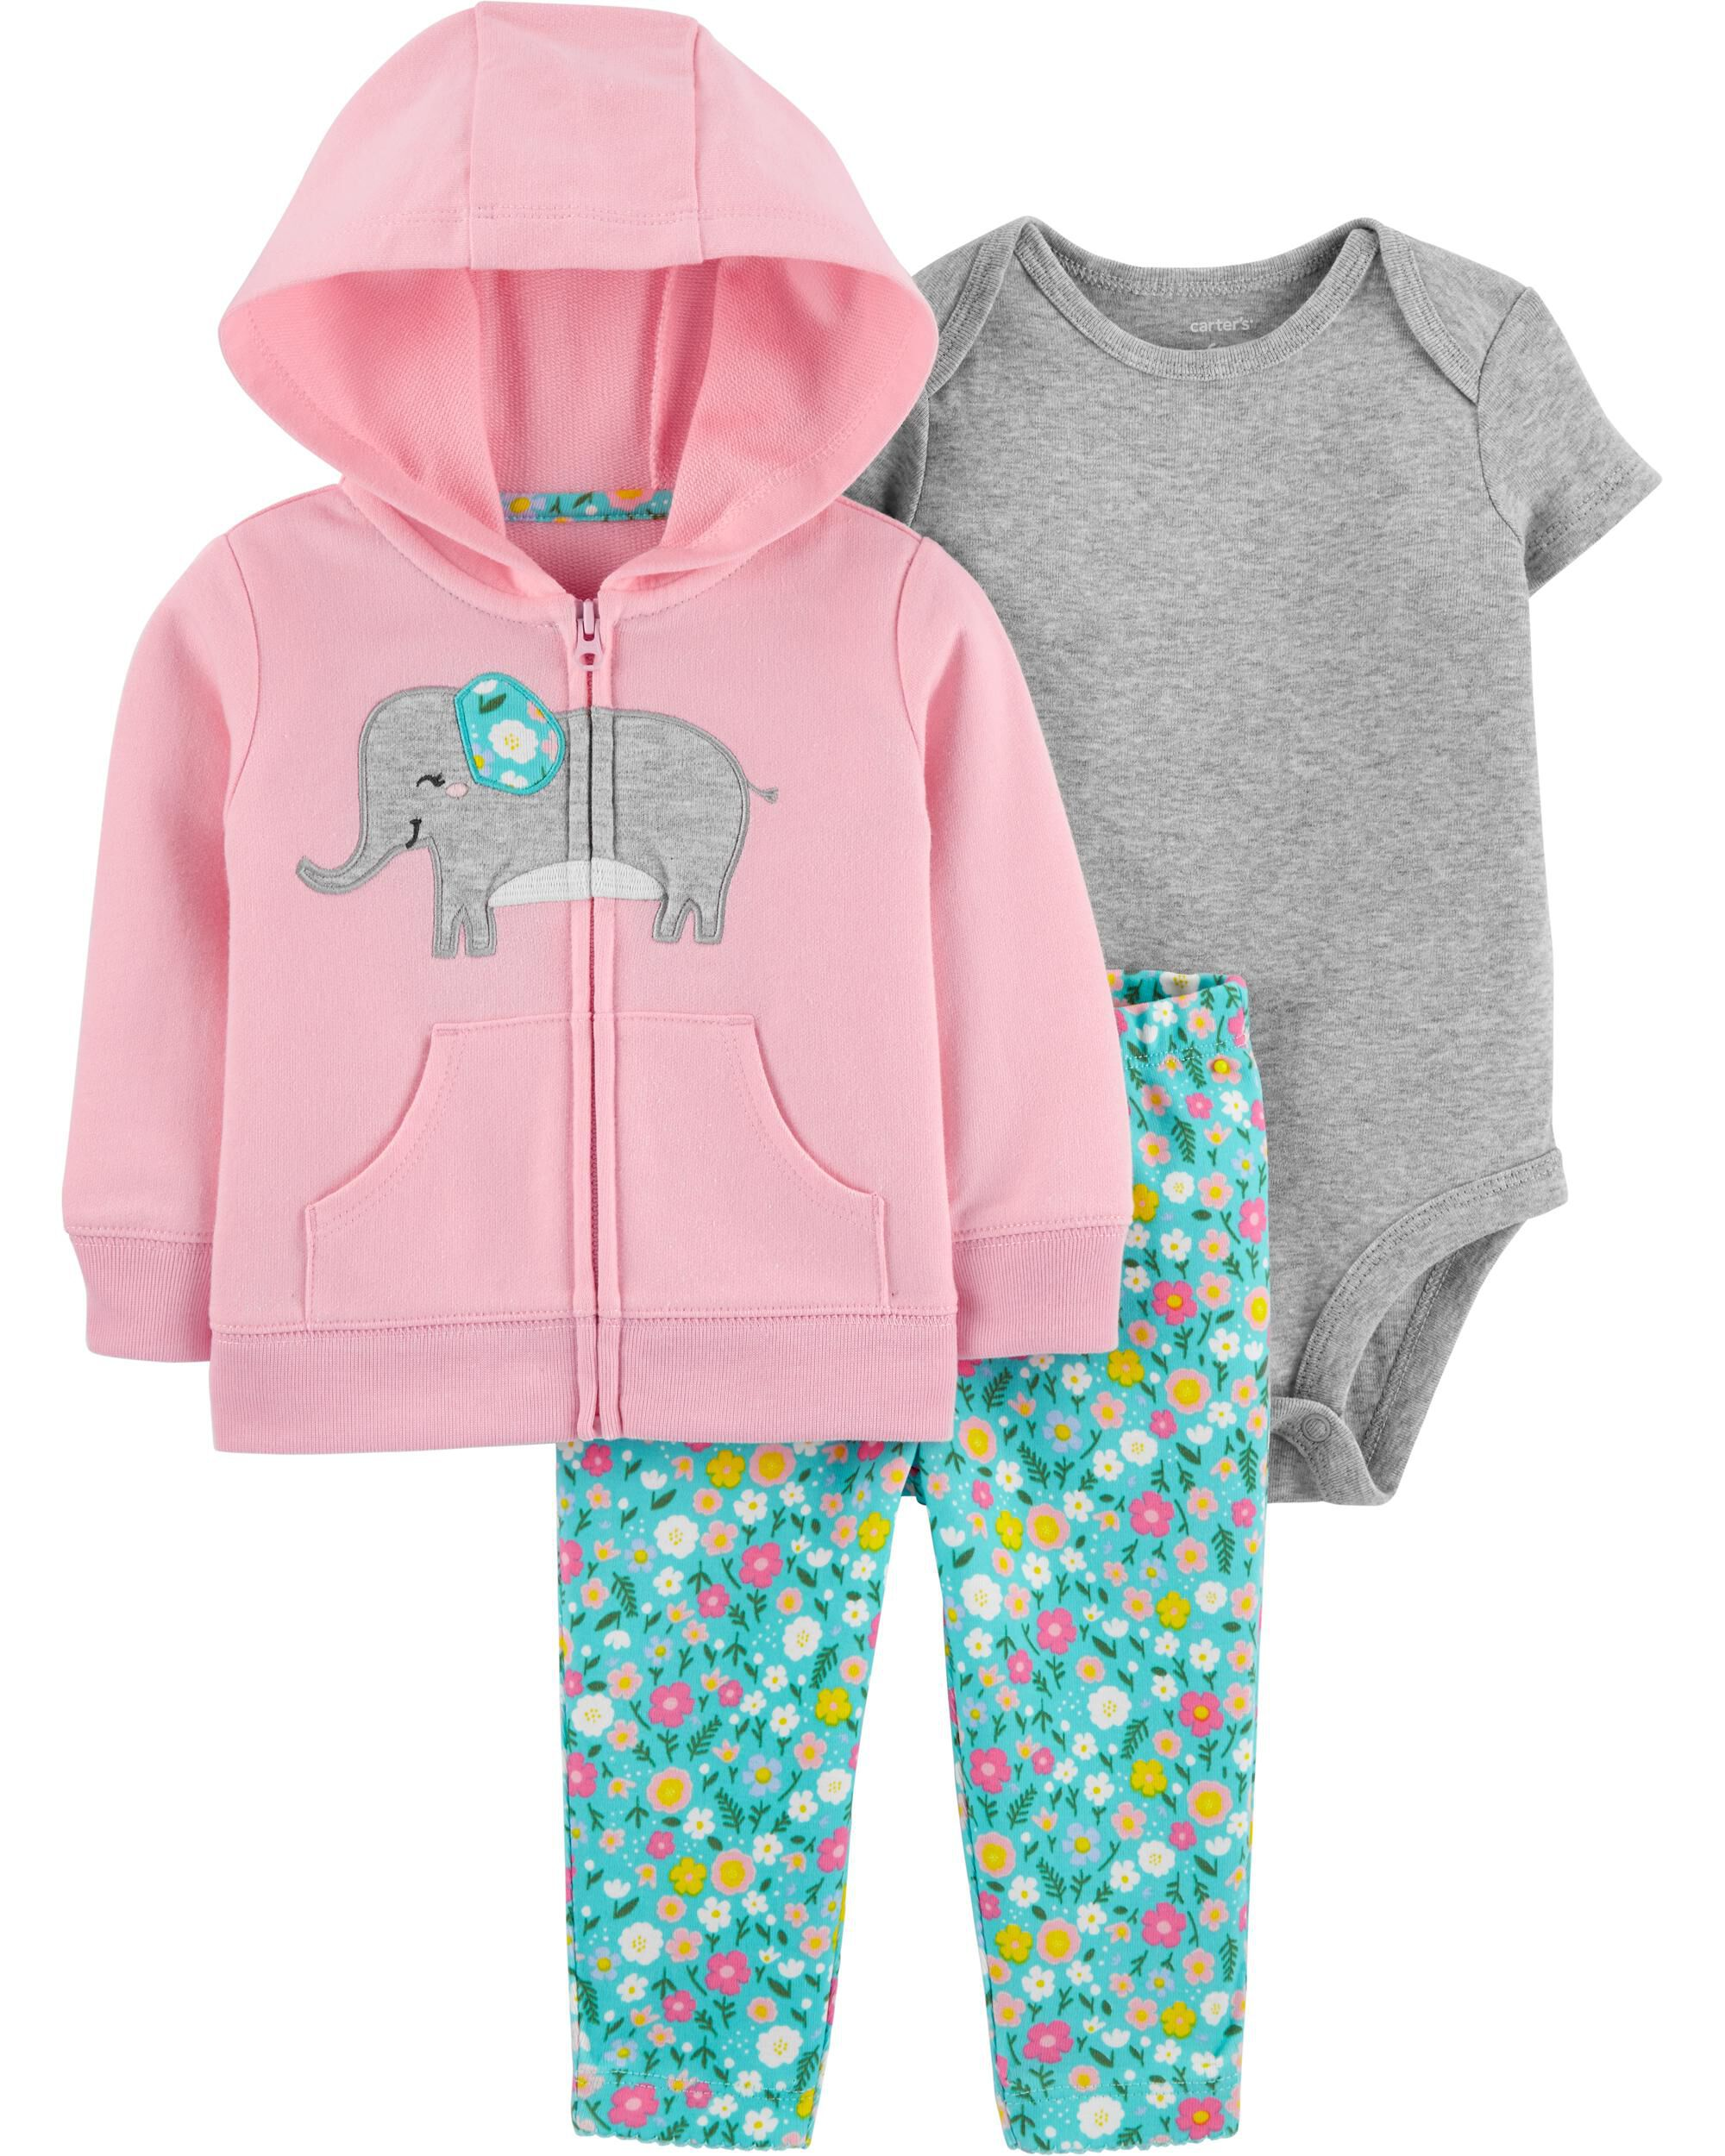 New Carter/'s Pink Hoodie Bodysuit Top /& Shorts Set Girls NWT 6m 9m 12m 18m Cute